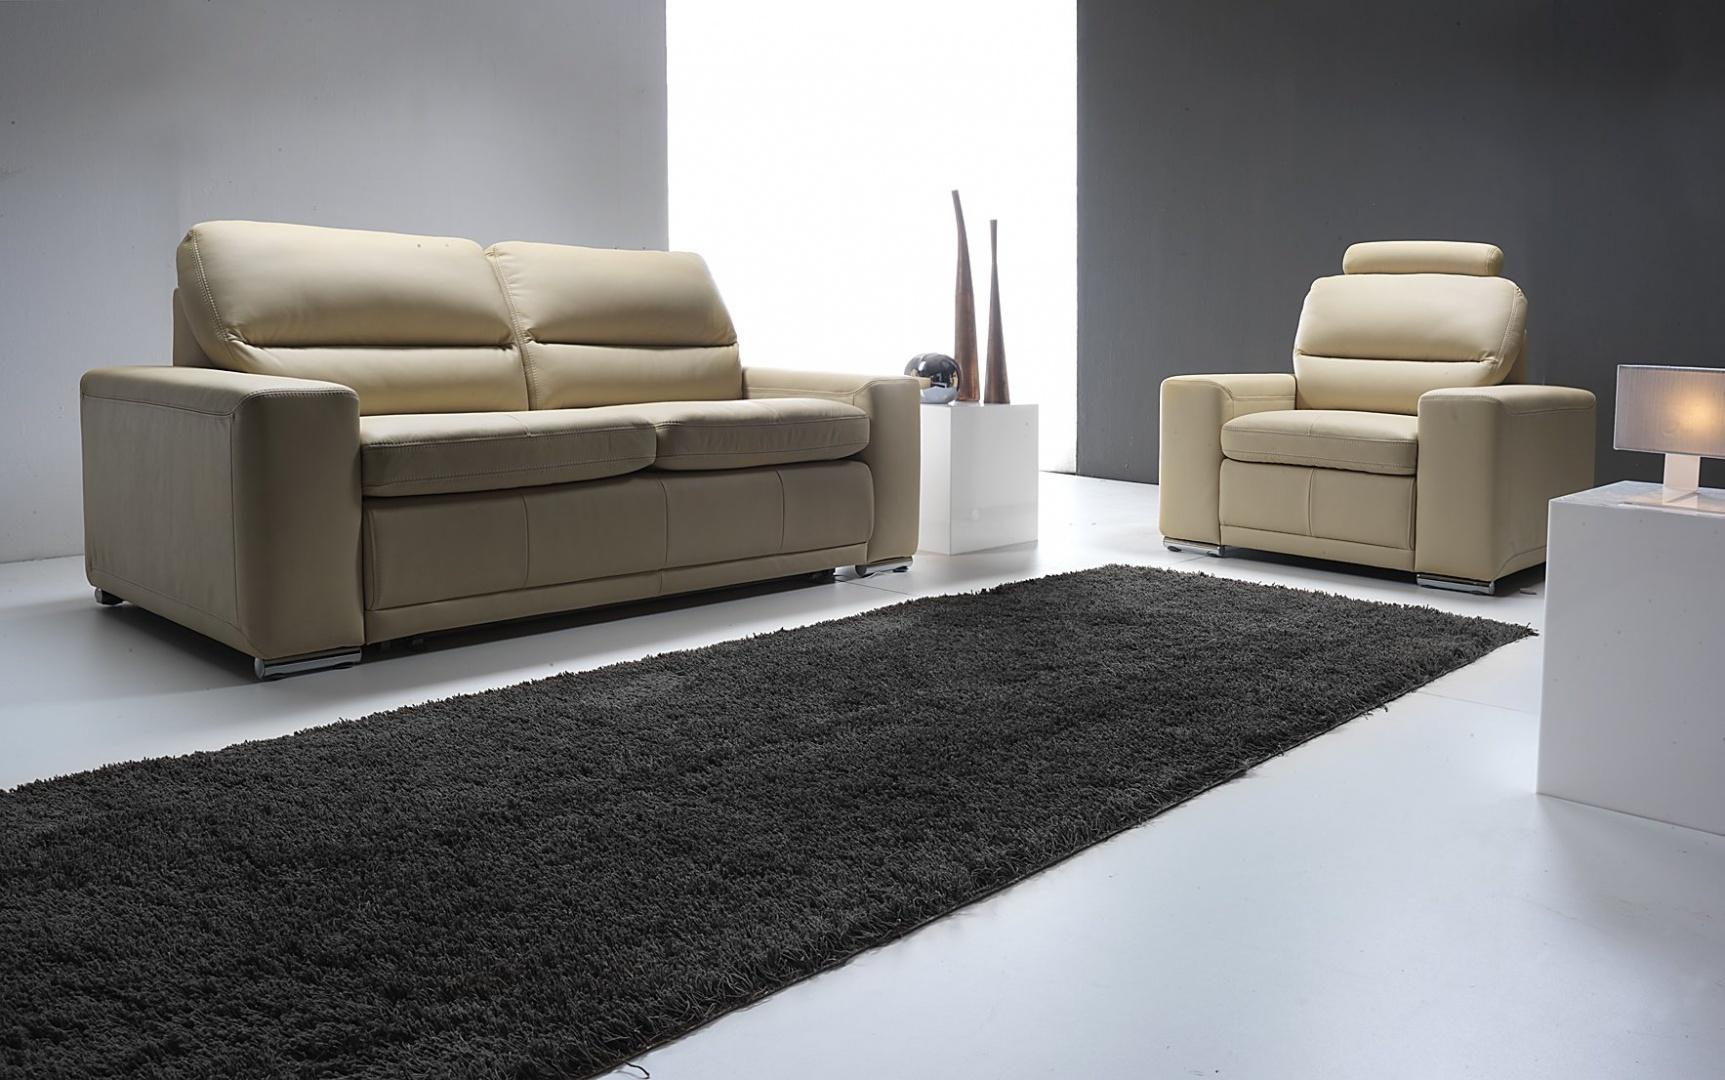 BONO комплект мягкой мебели 89539